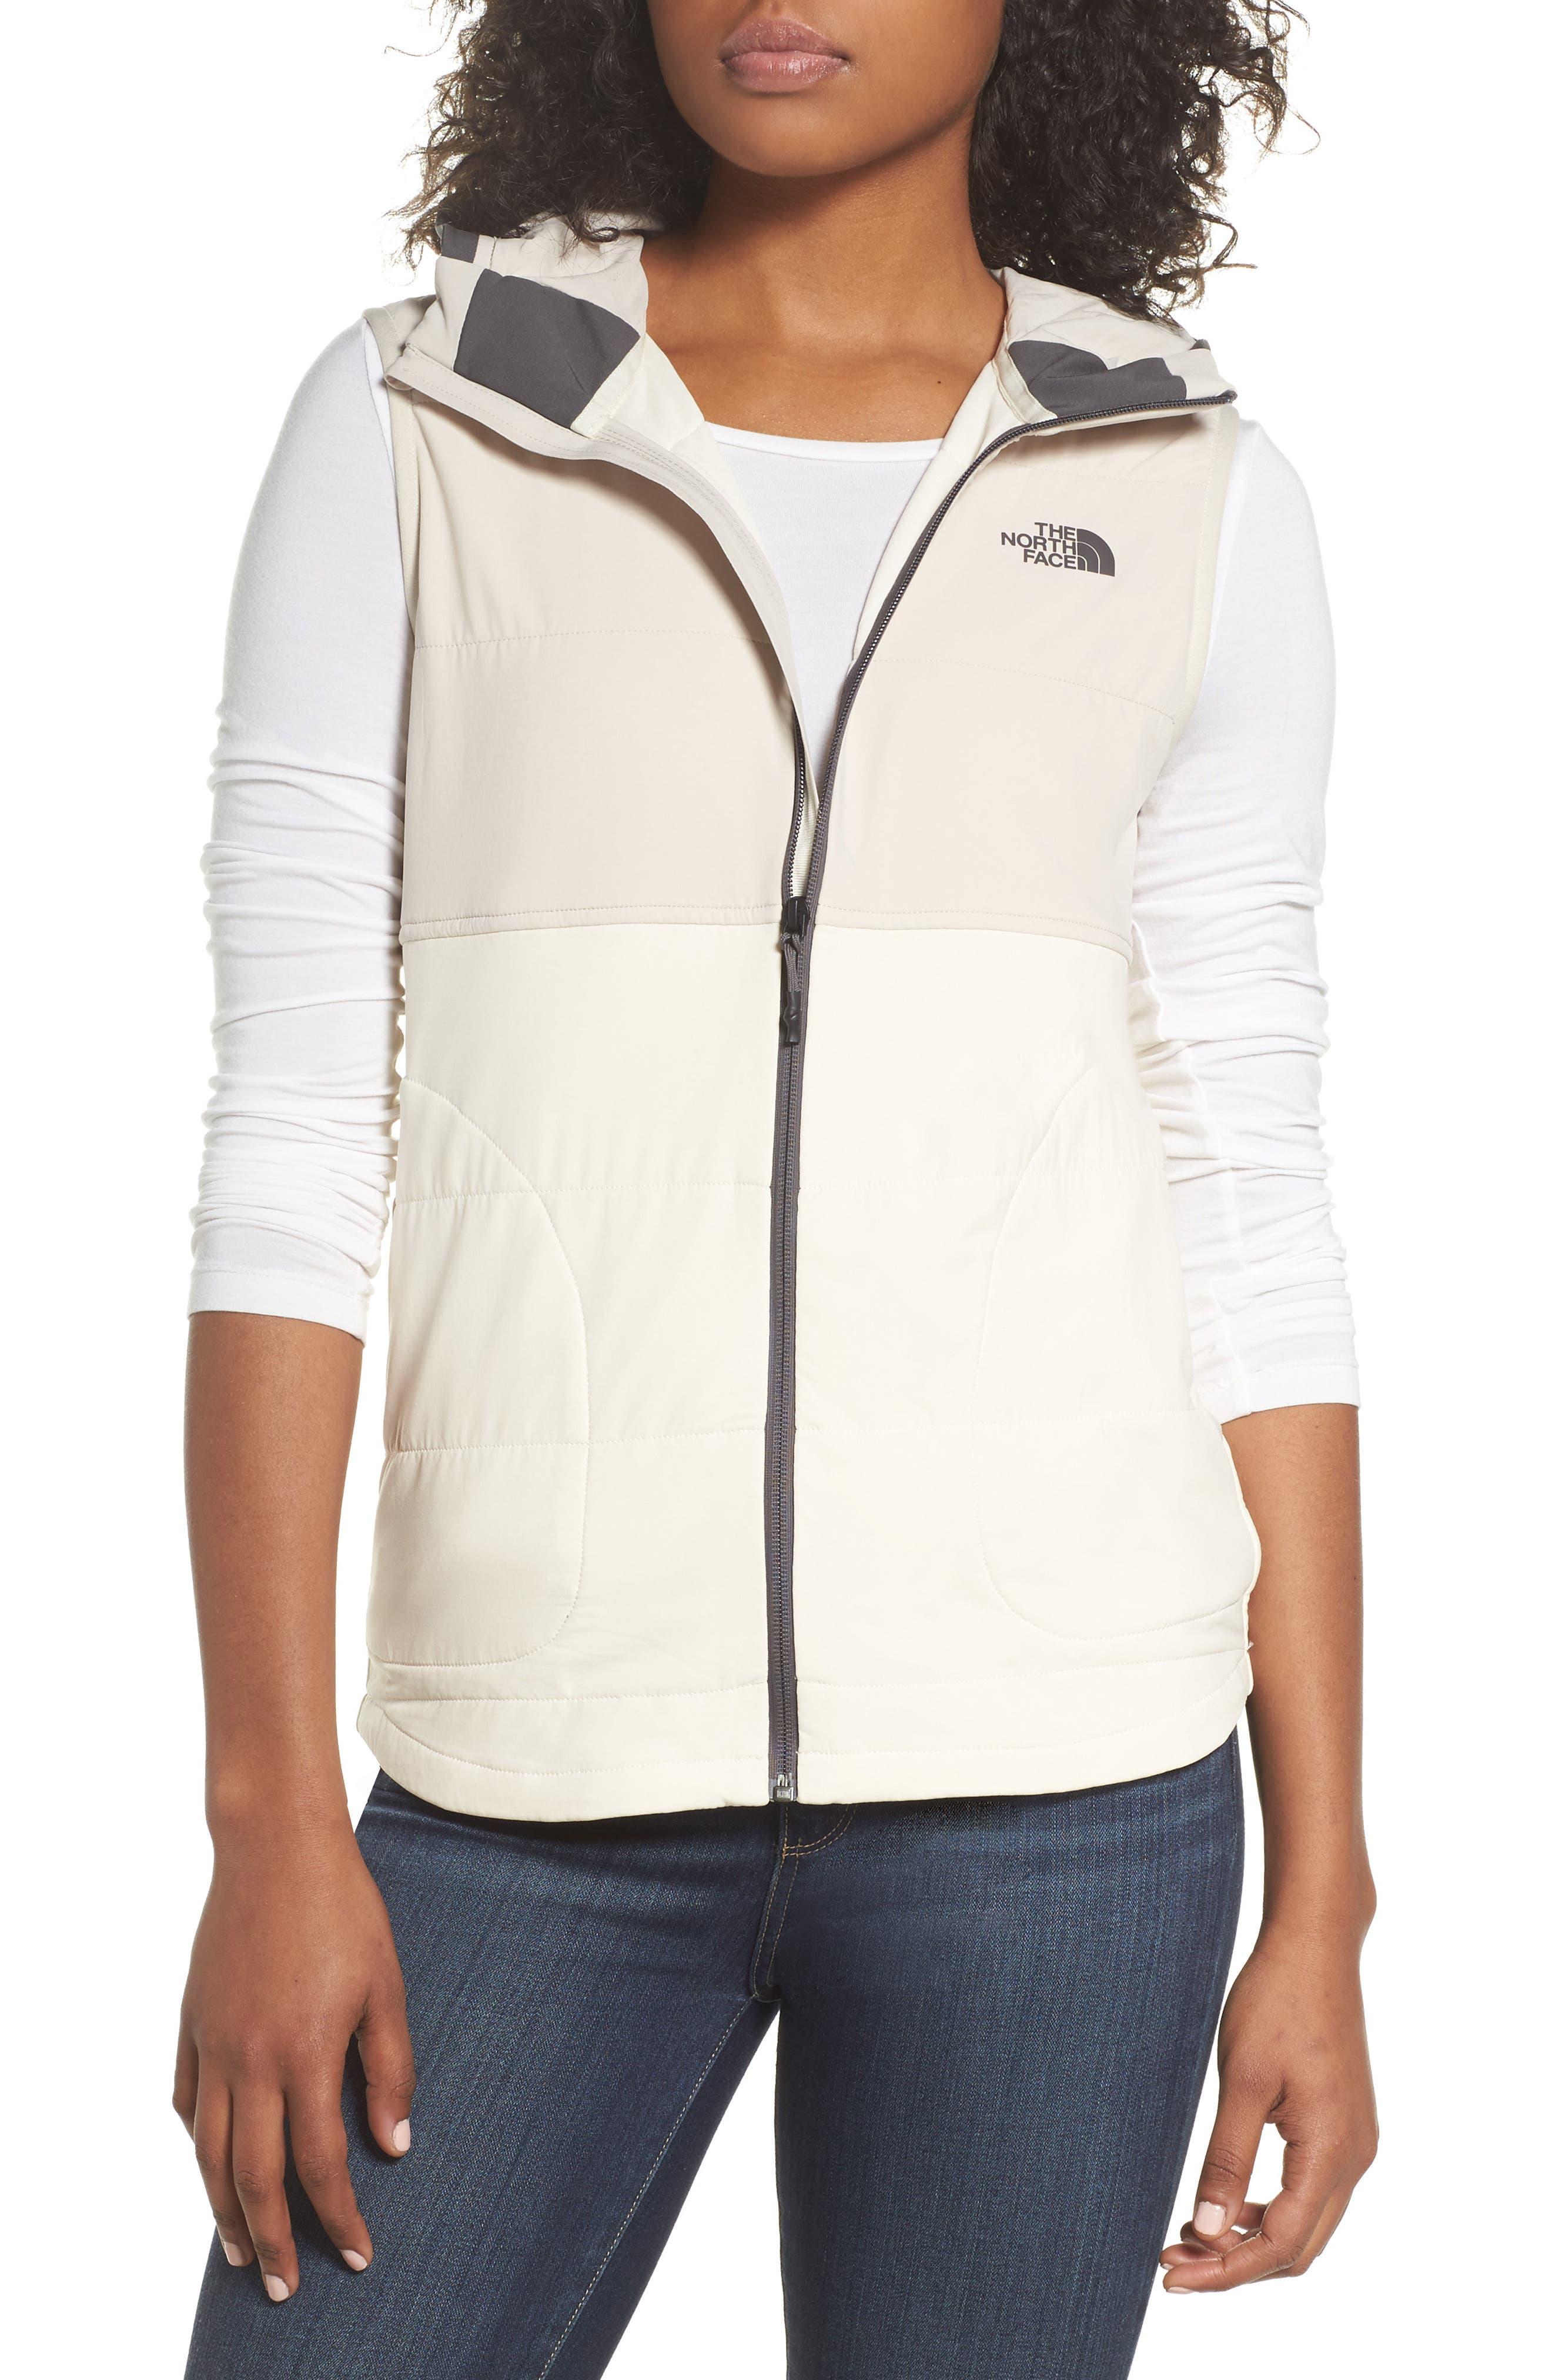 Mountain Sweatshirt Insulated Hooded Vest,                         Main,                         color, Vintage White/ Peyote Beige